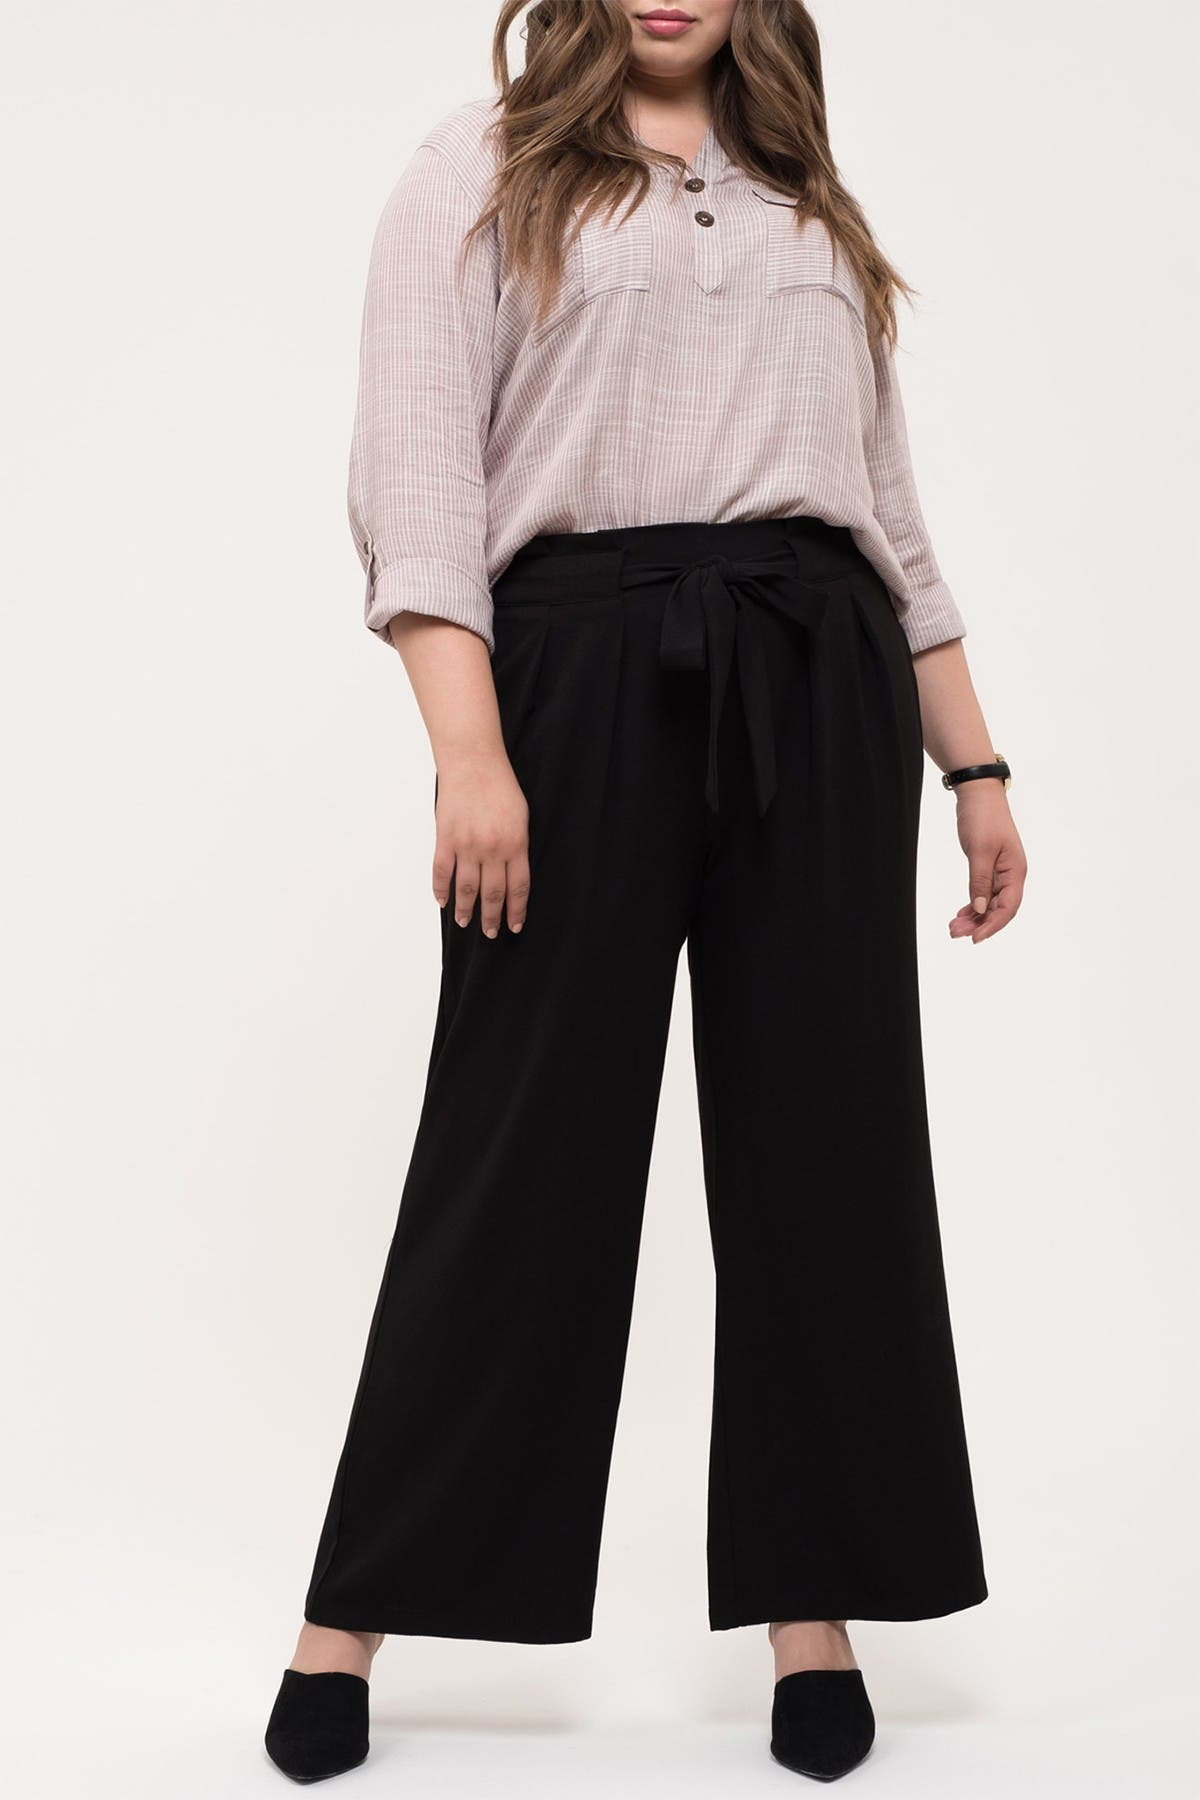 Image of Perch by Blu Pepper Tie Waist Paperbag Pants